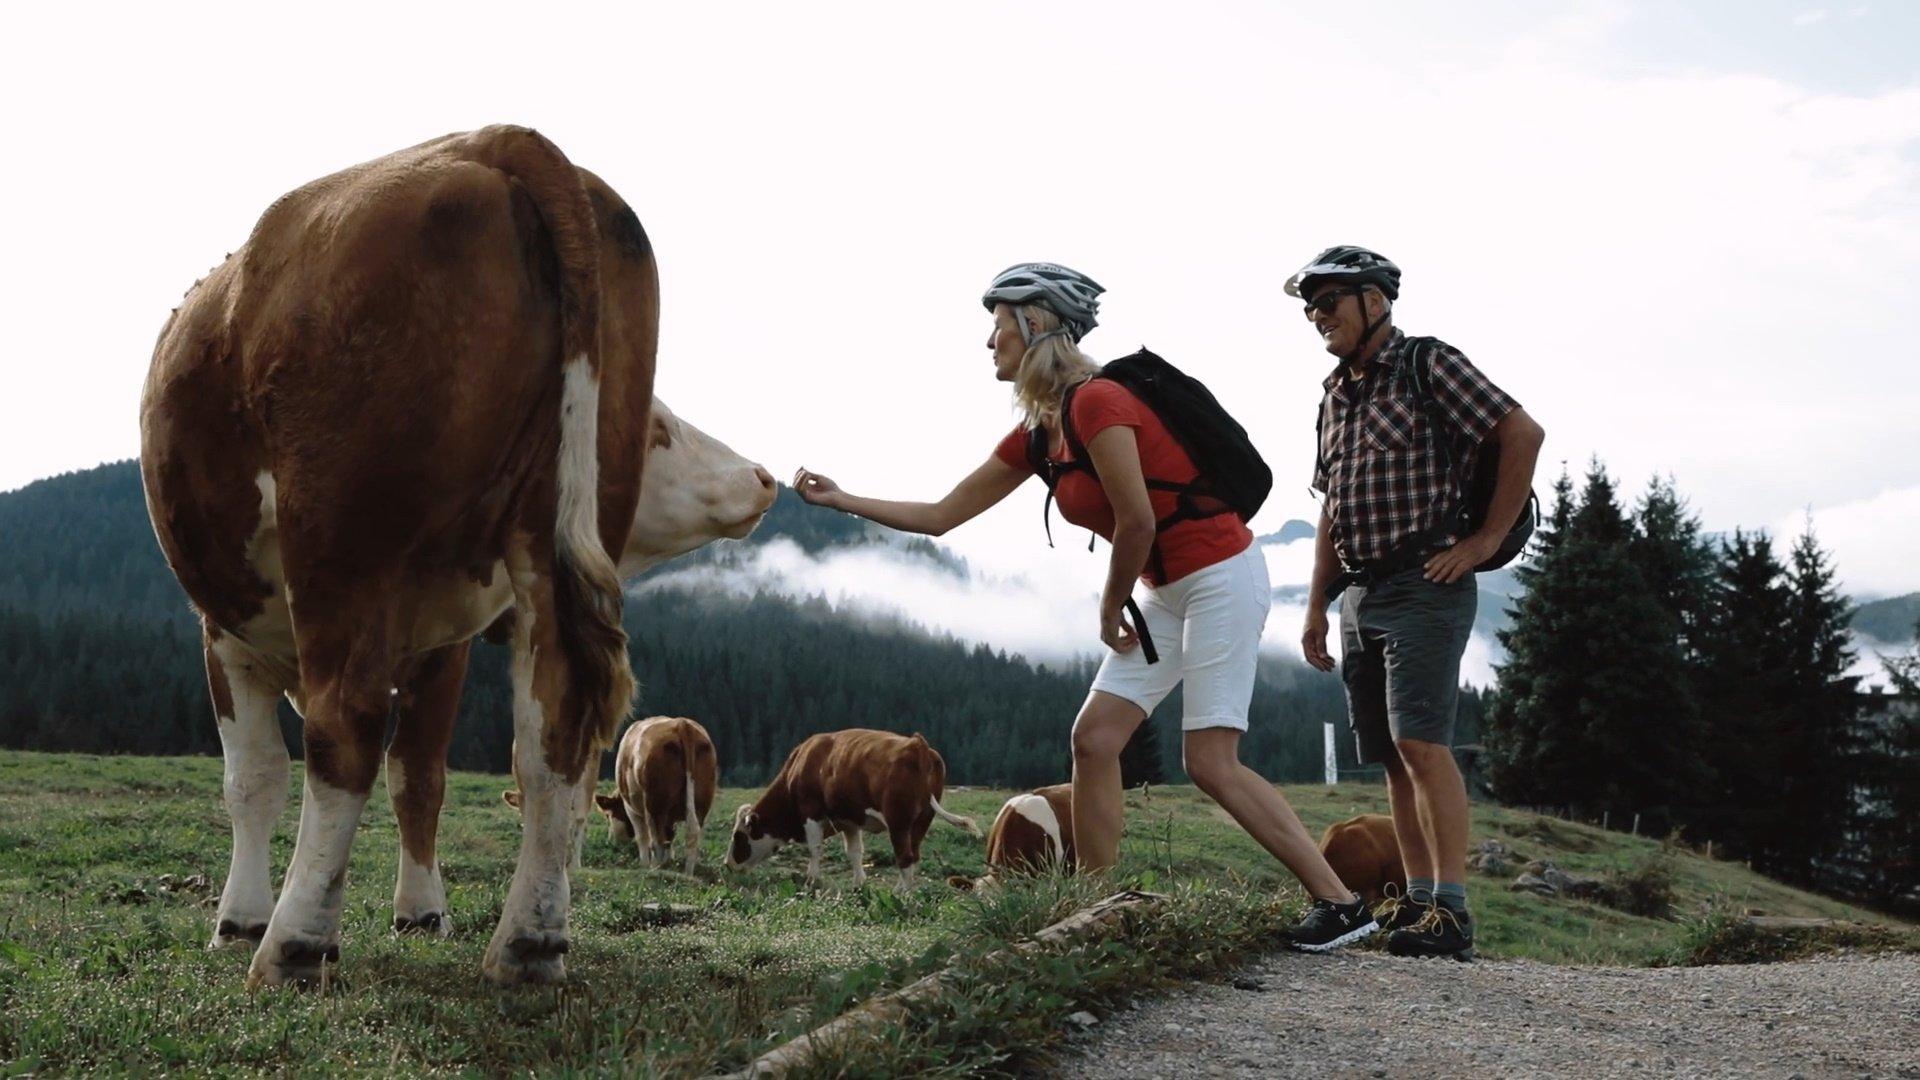 Chiemgau g'filmt - #14 Motiviert & motorisiert